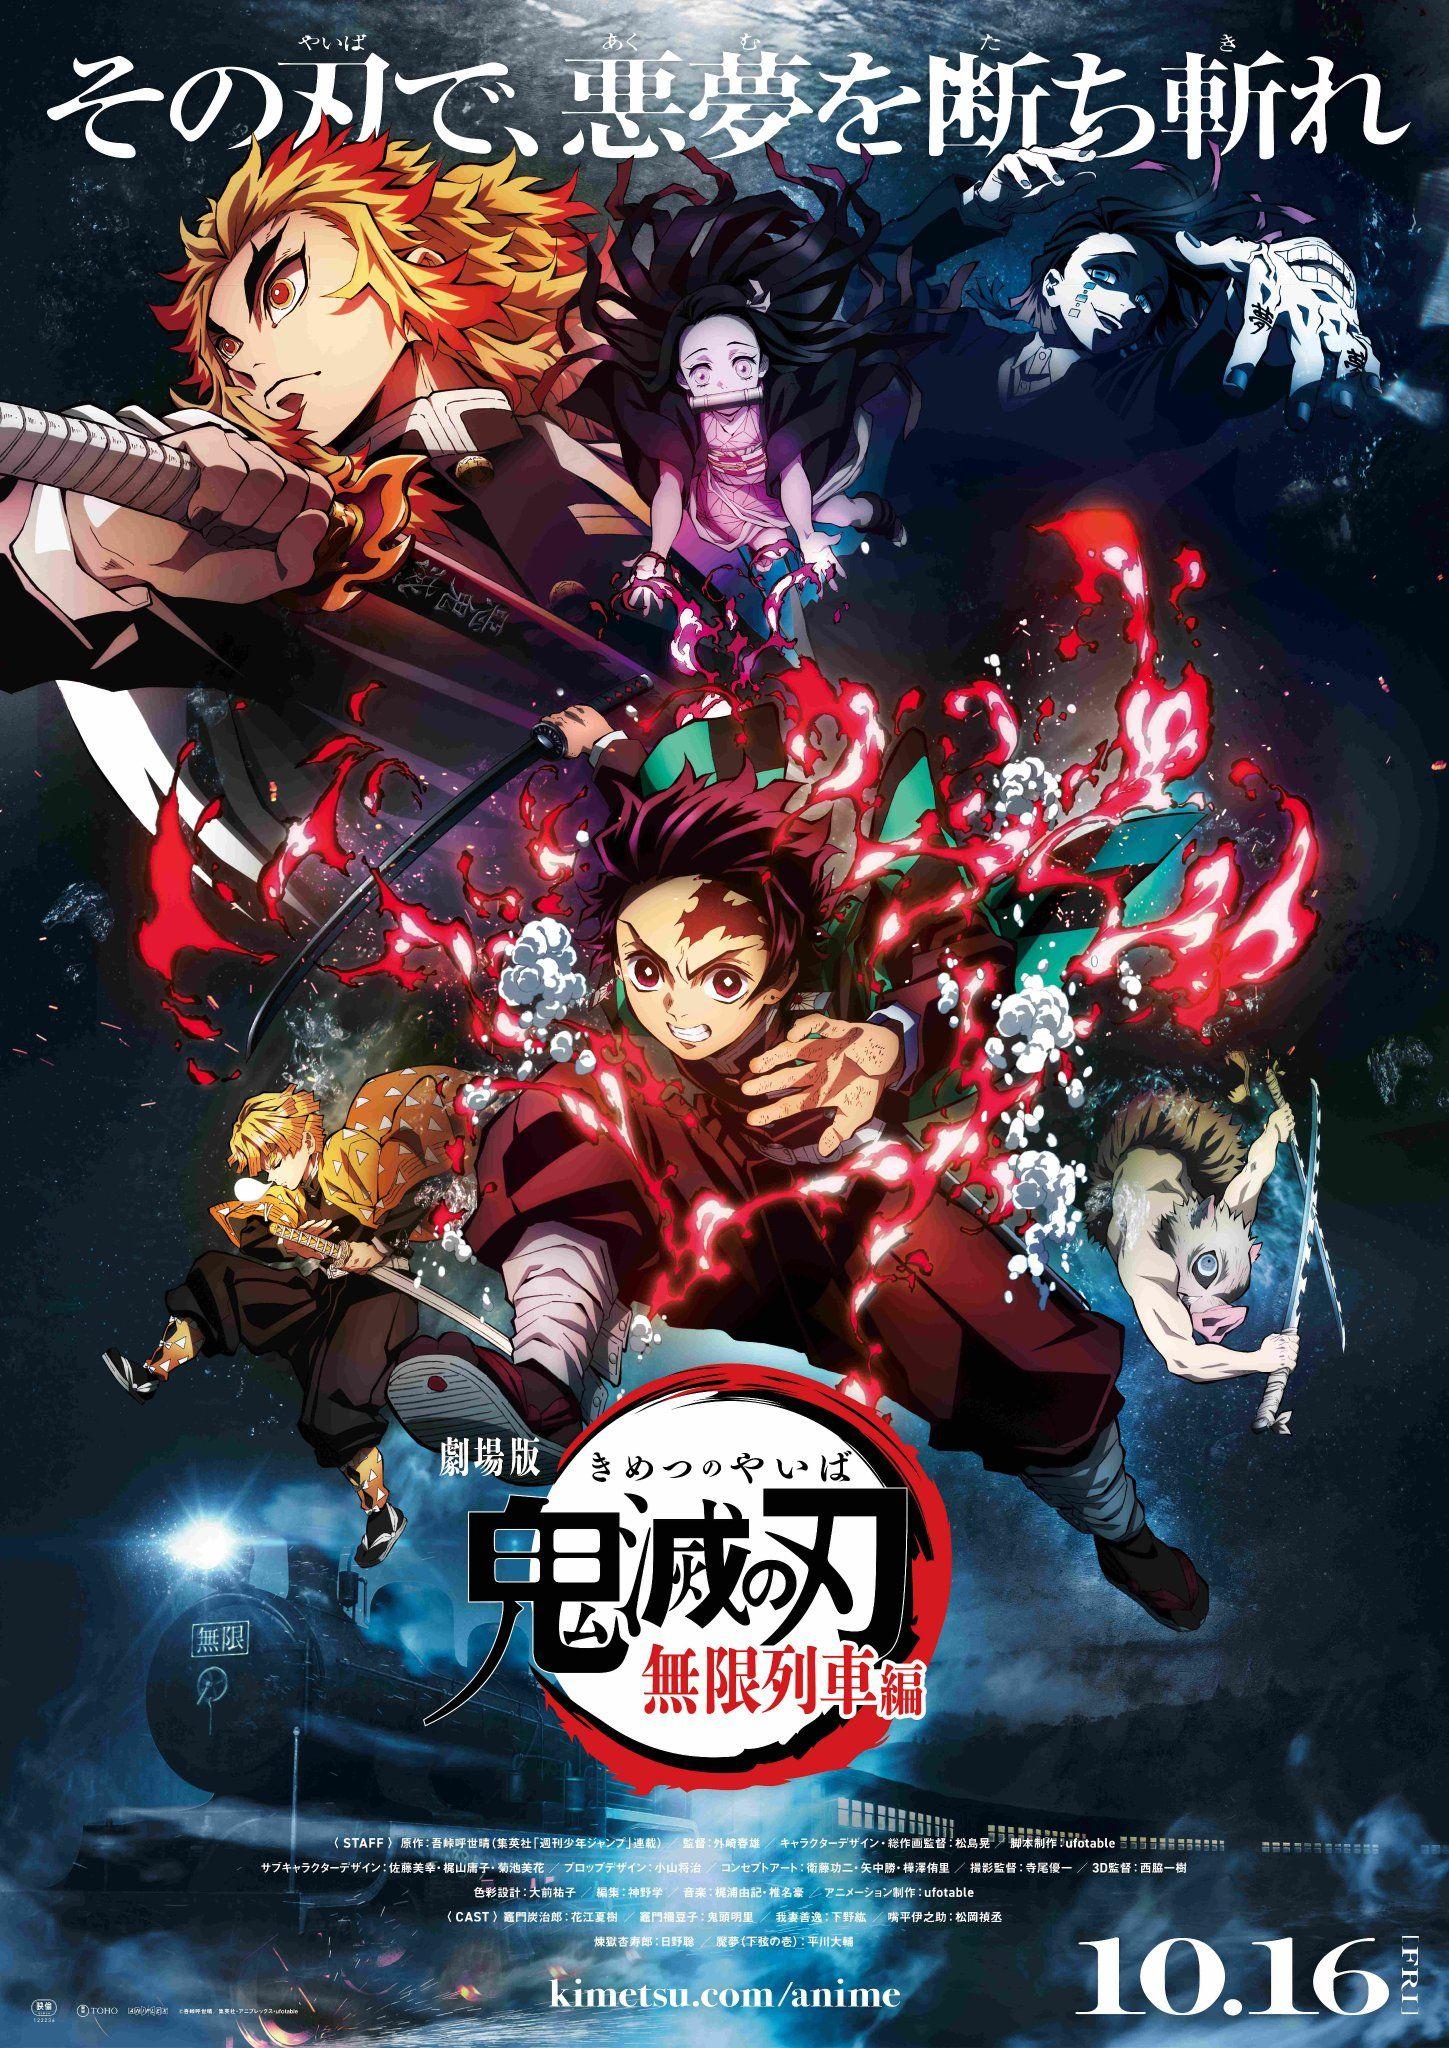 El Palomitron Anime On Twitter Anime Movies Anime Slayer Anime